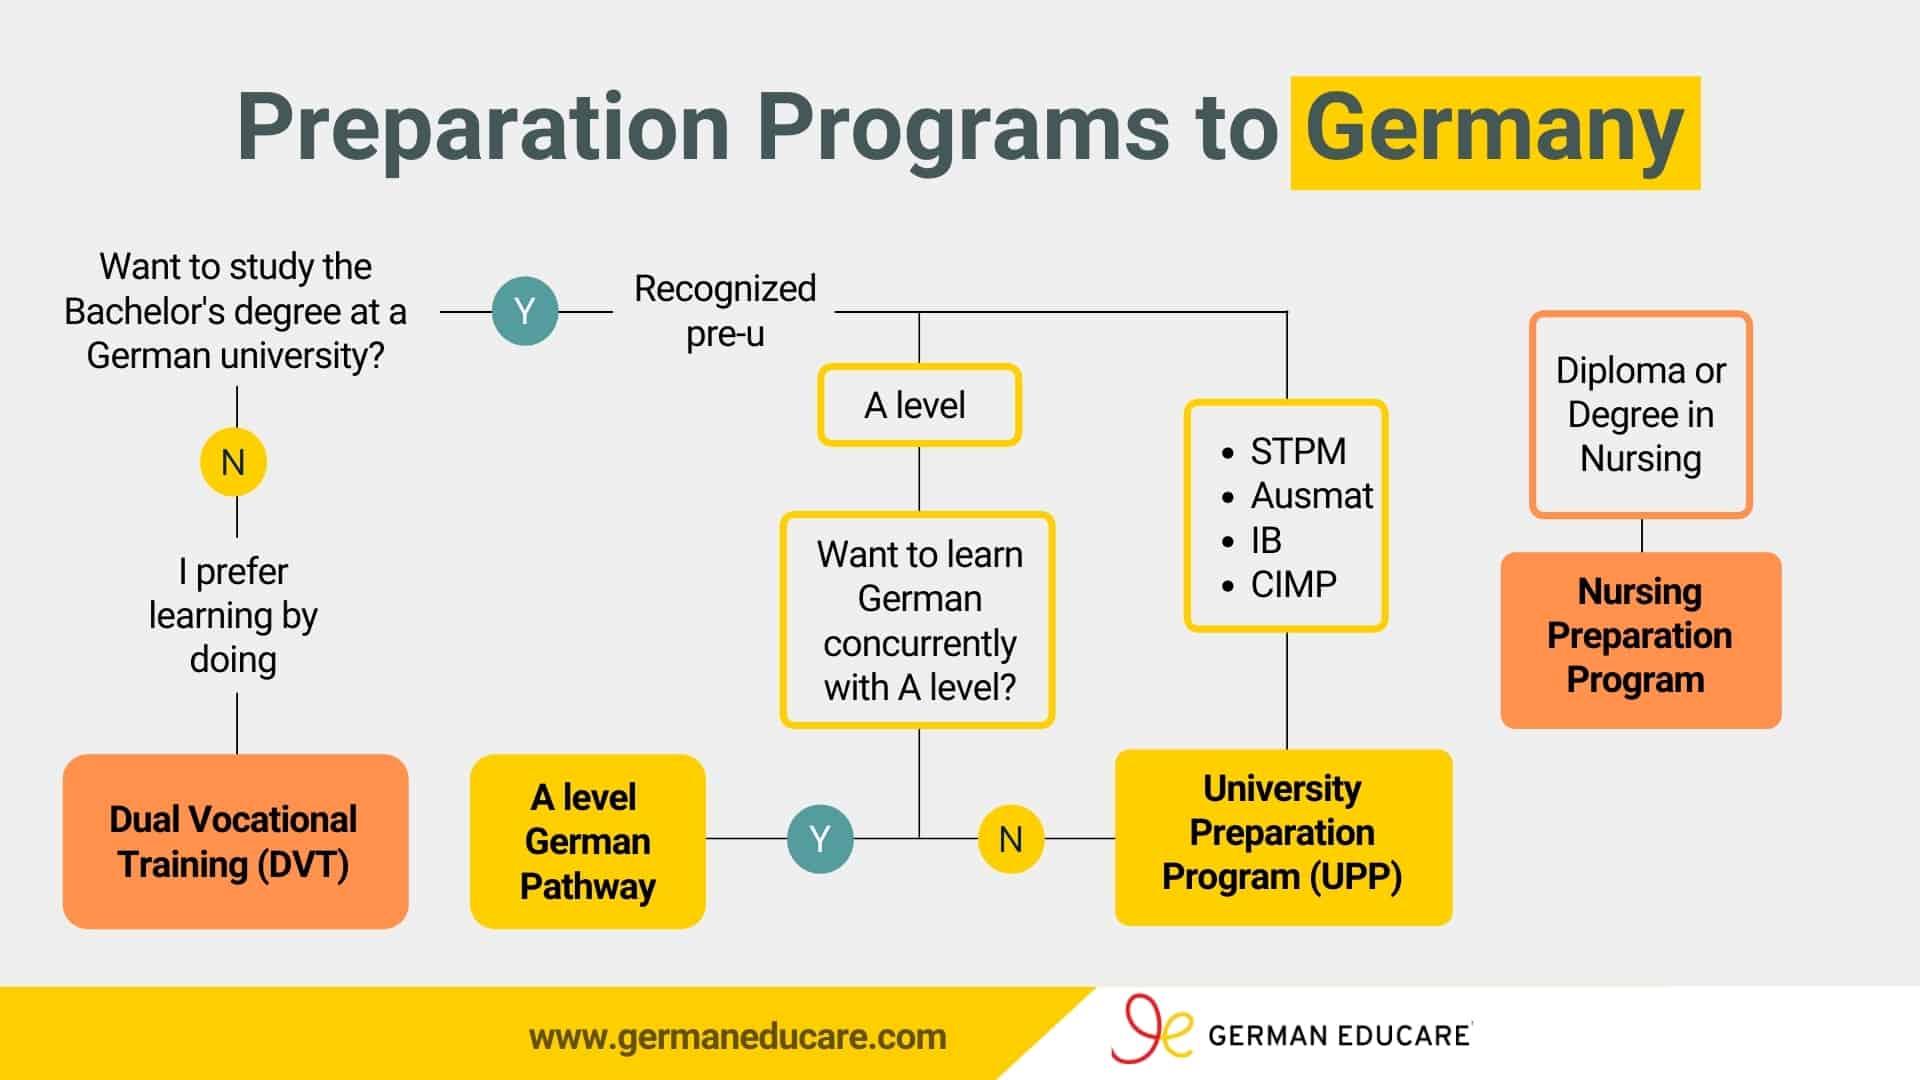 German Educare preparation programs